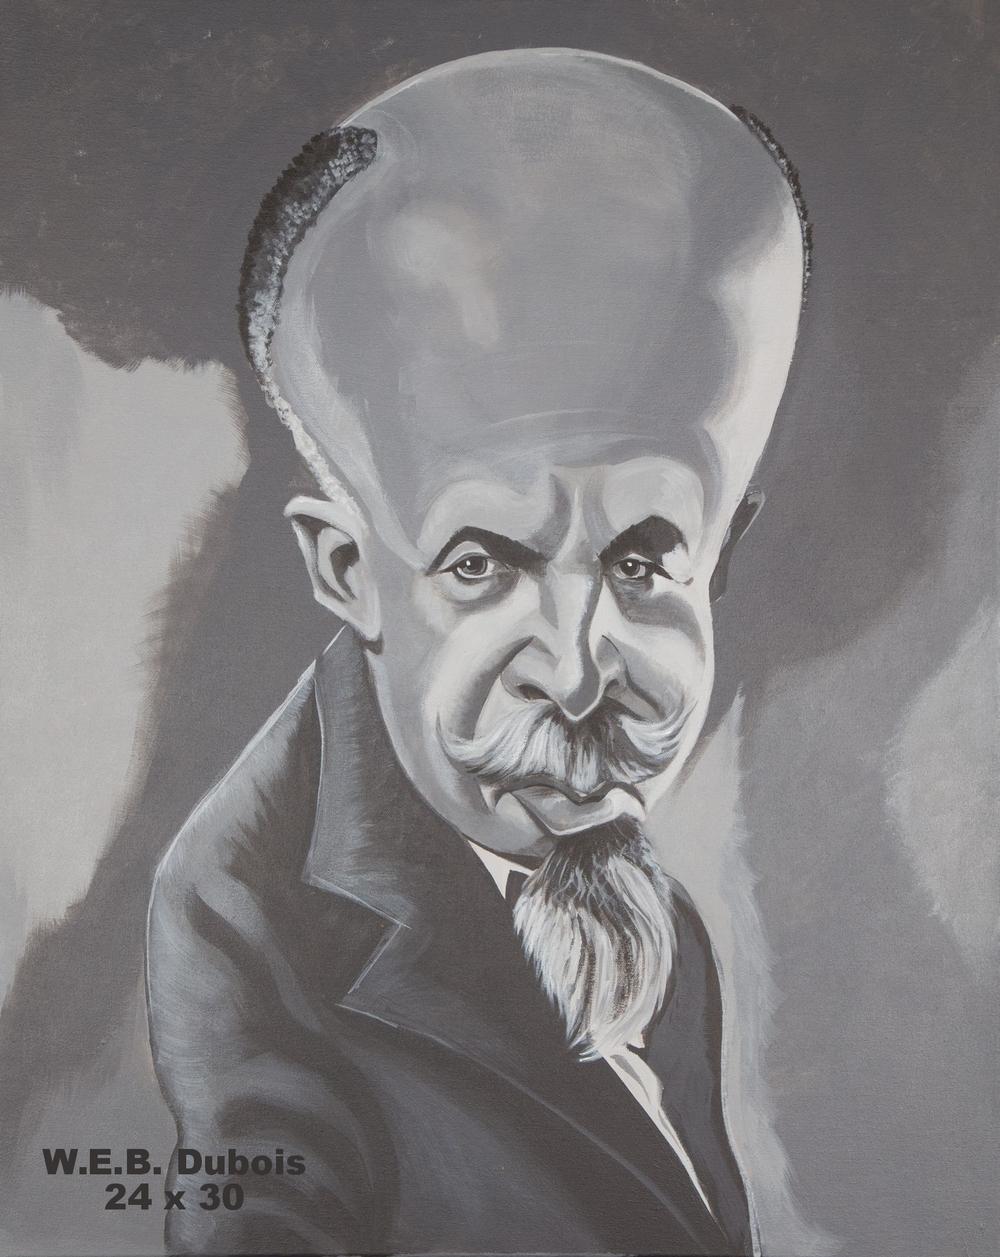 W.E.B. Dubois 24 x 30.jpeg